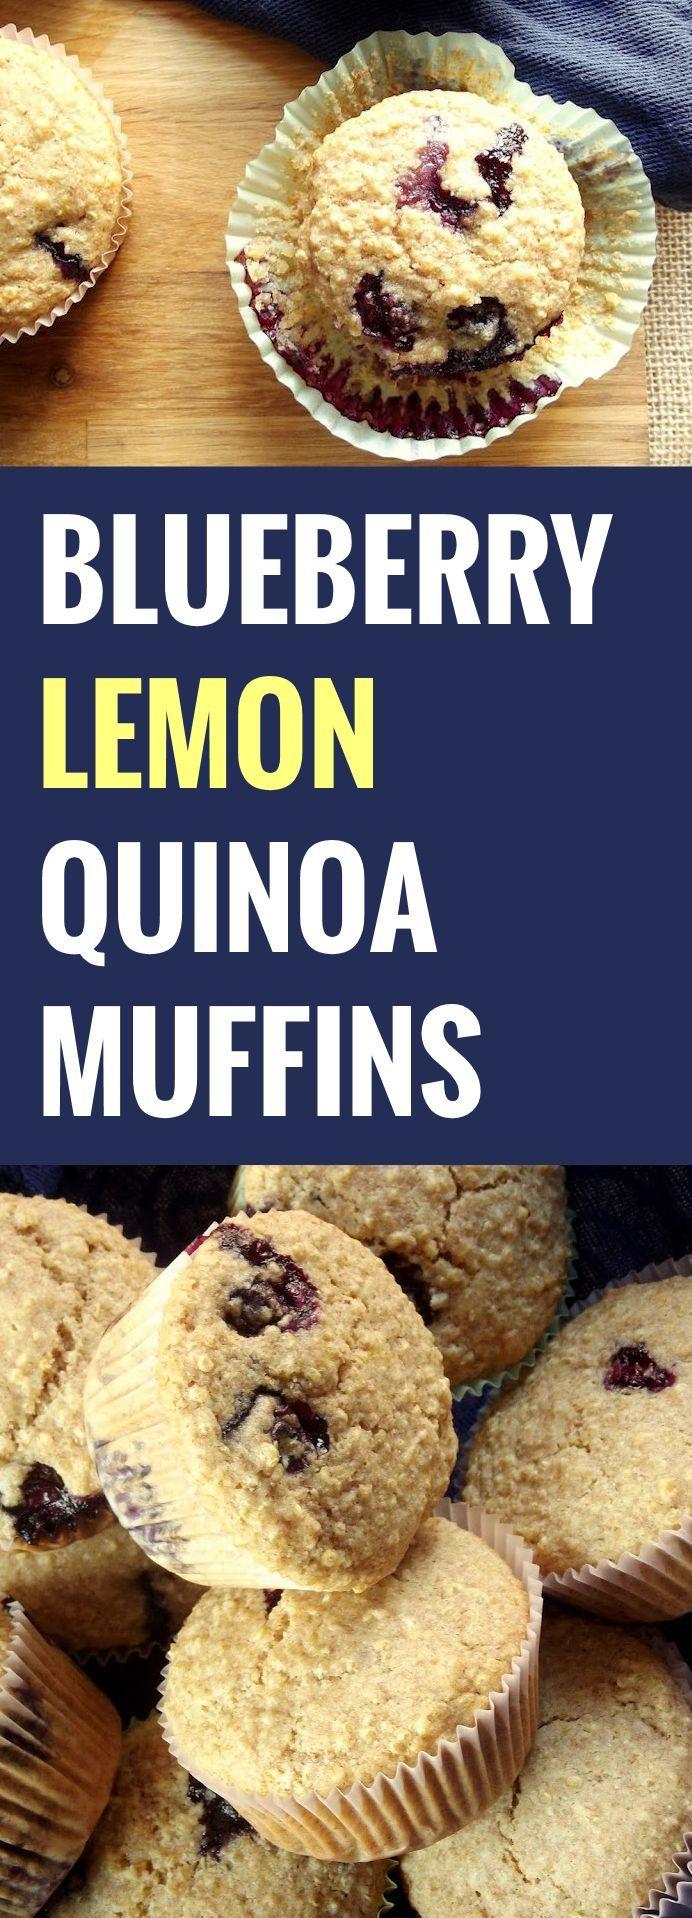 Blueberry Lemon Quinoa Muffins - instead use oat flour, honey and coconut yogurt